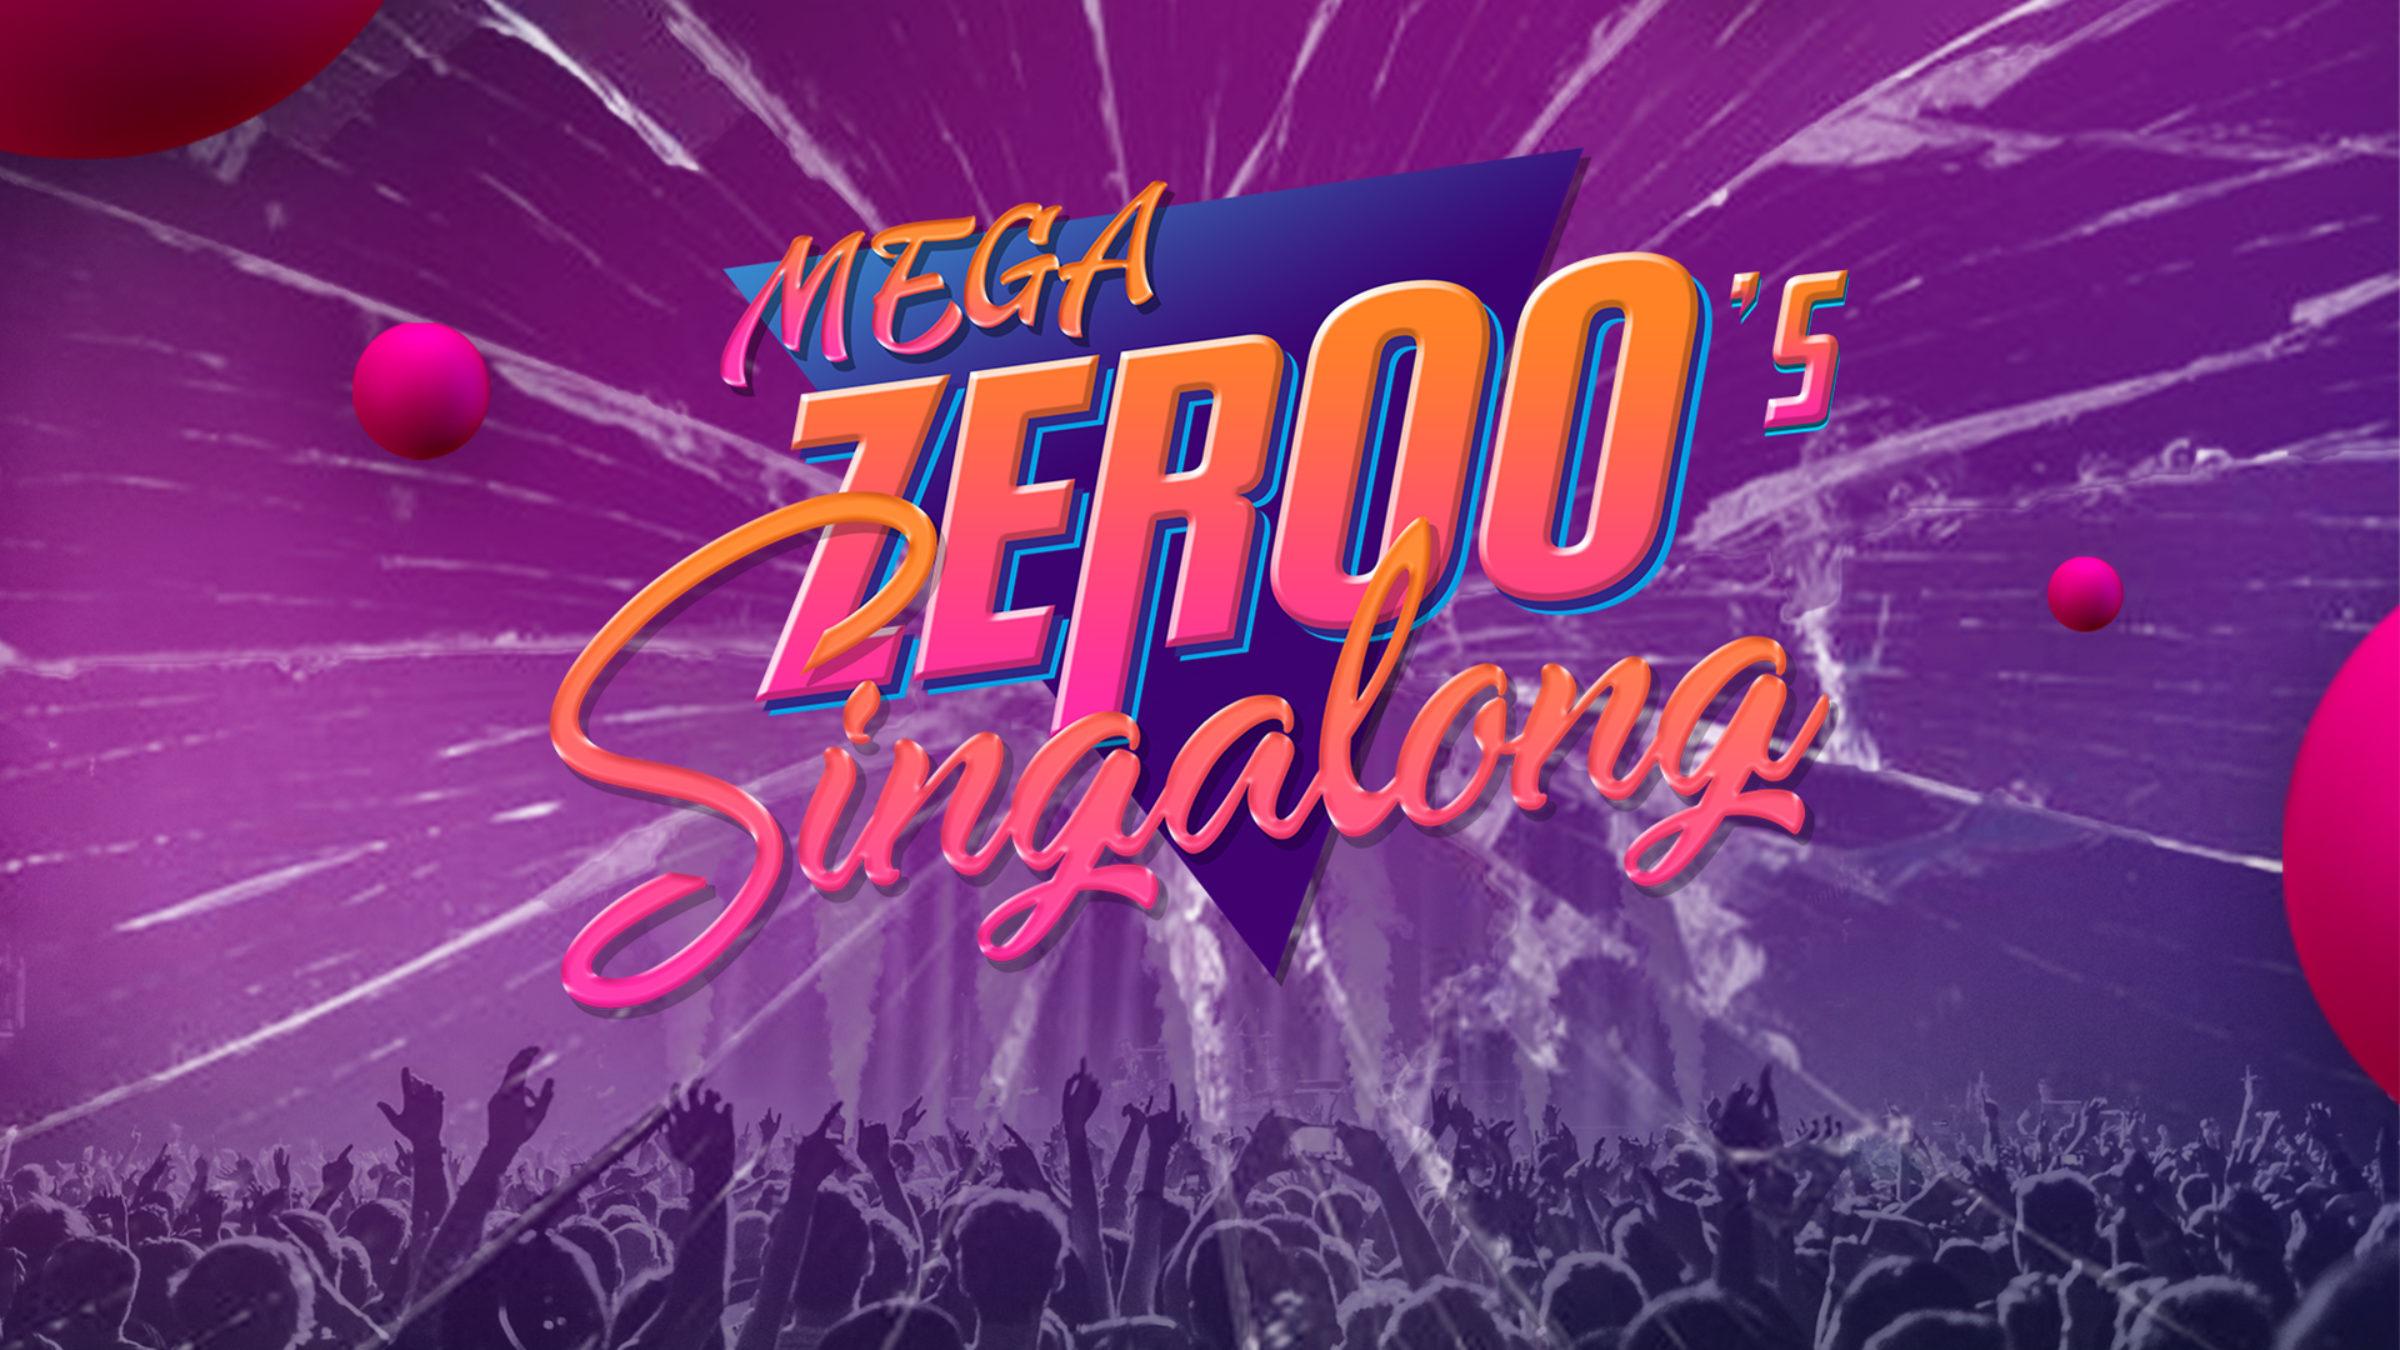 Mega zeroes singalong web 35hxtf6gqw